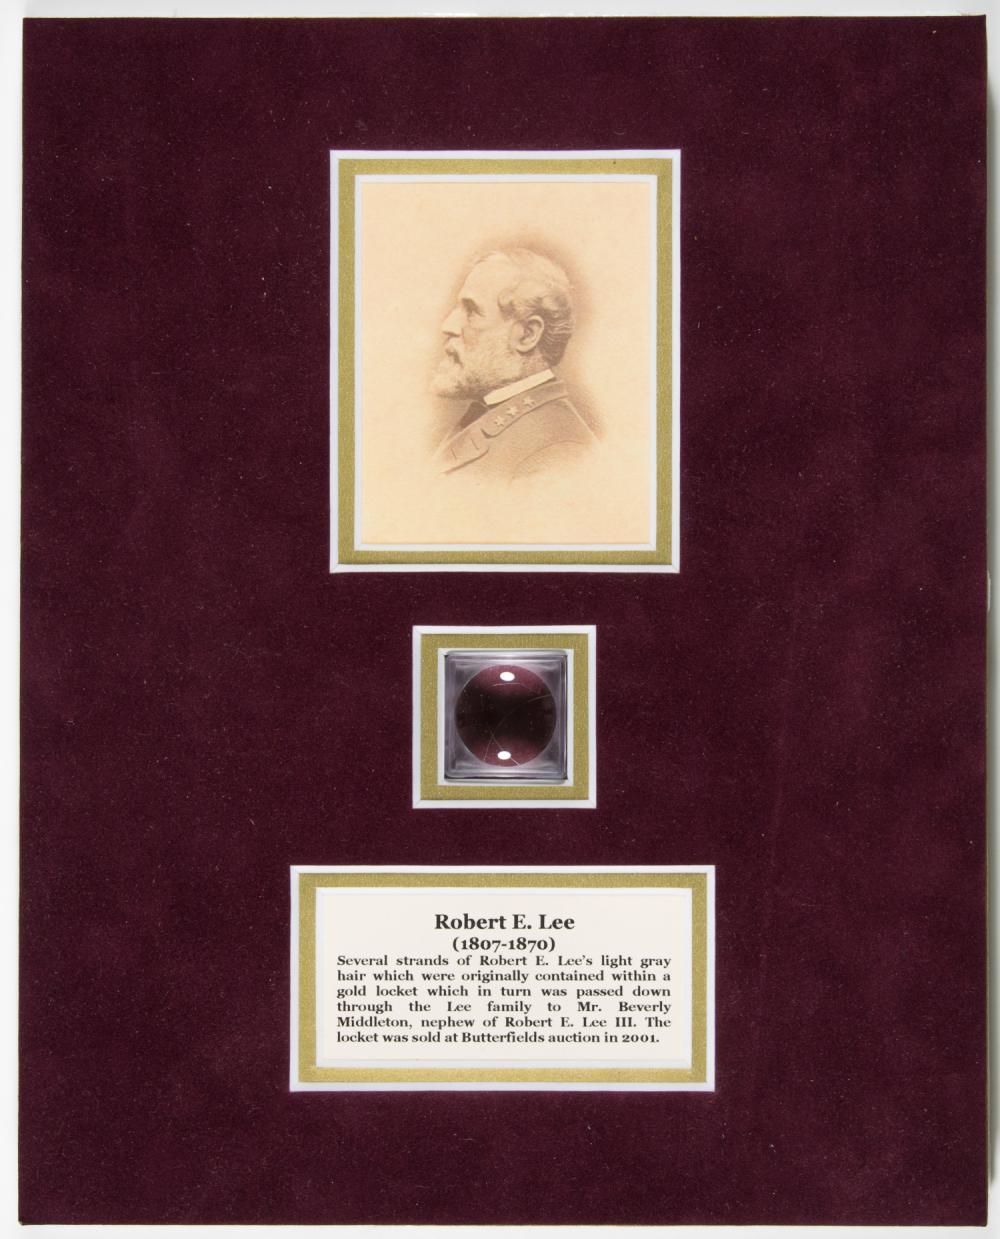 A SMALL LOCK OF ROBERT E. LEE'S HAIR